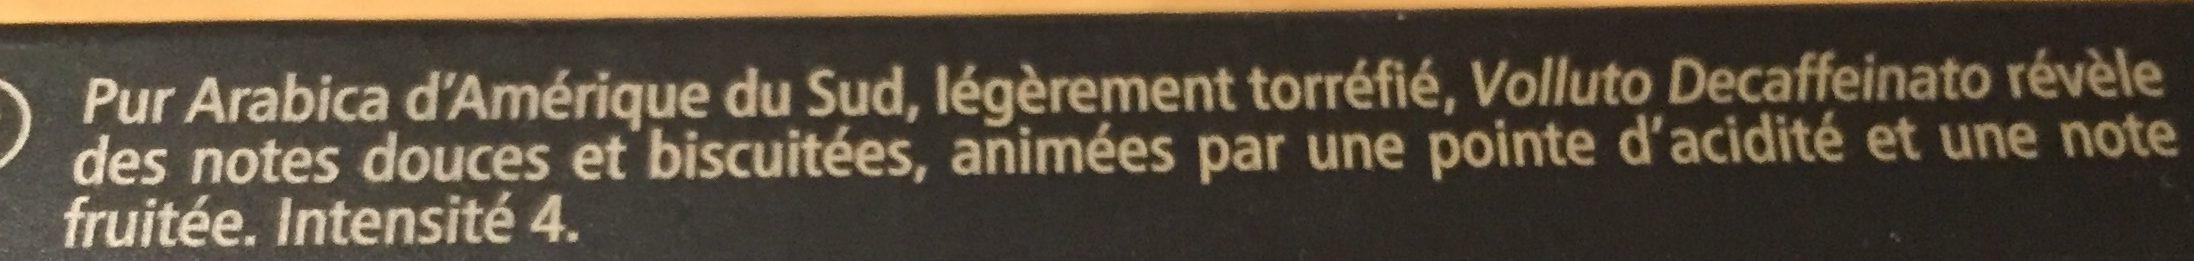 Volluto decaffeinato - Ingredients